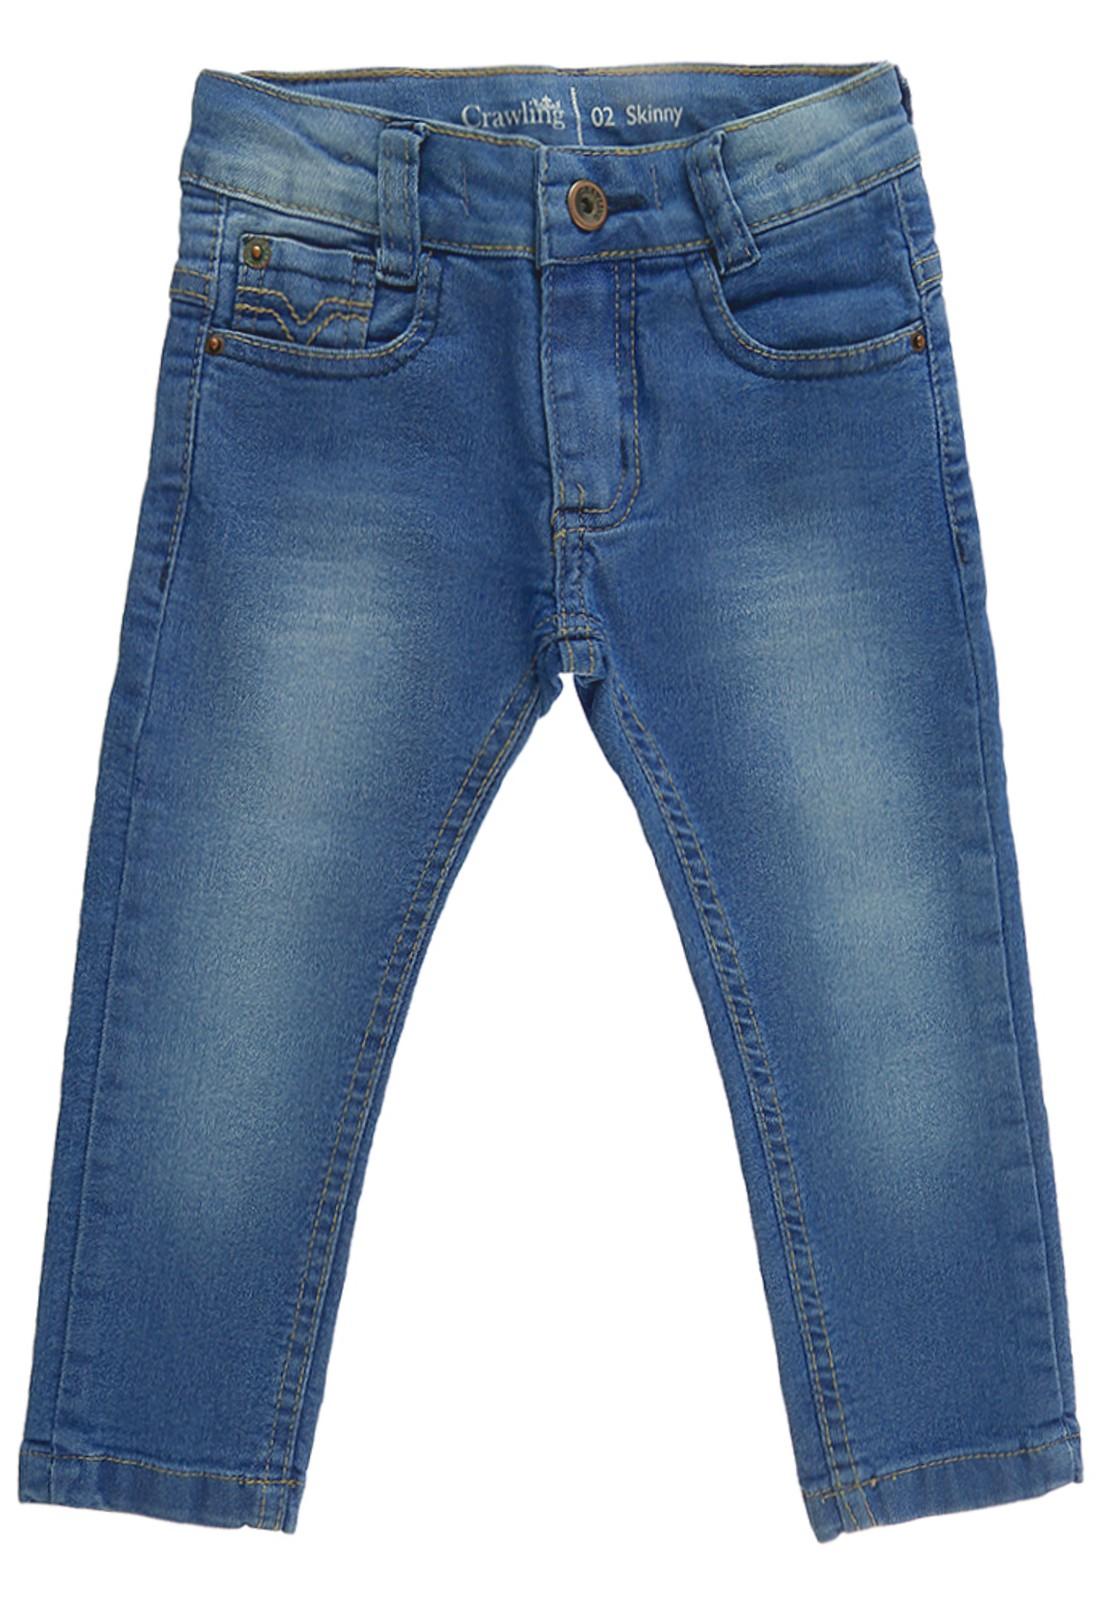 Calça Skinny Infantil Bebê Crawling Jeans